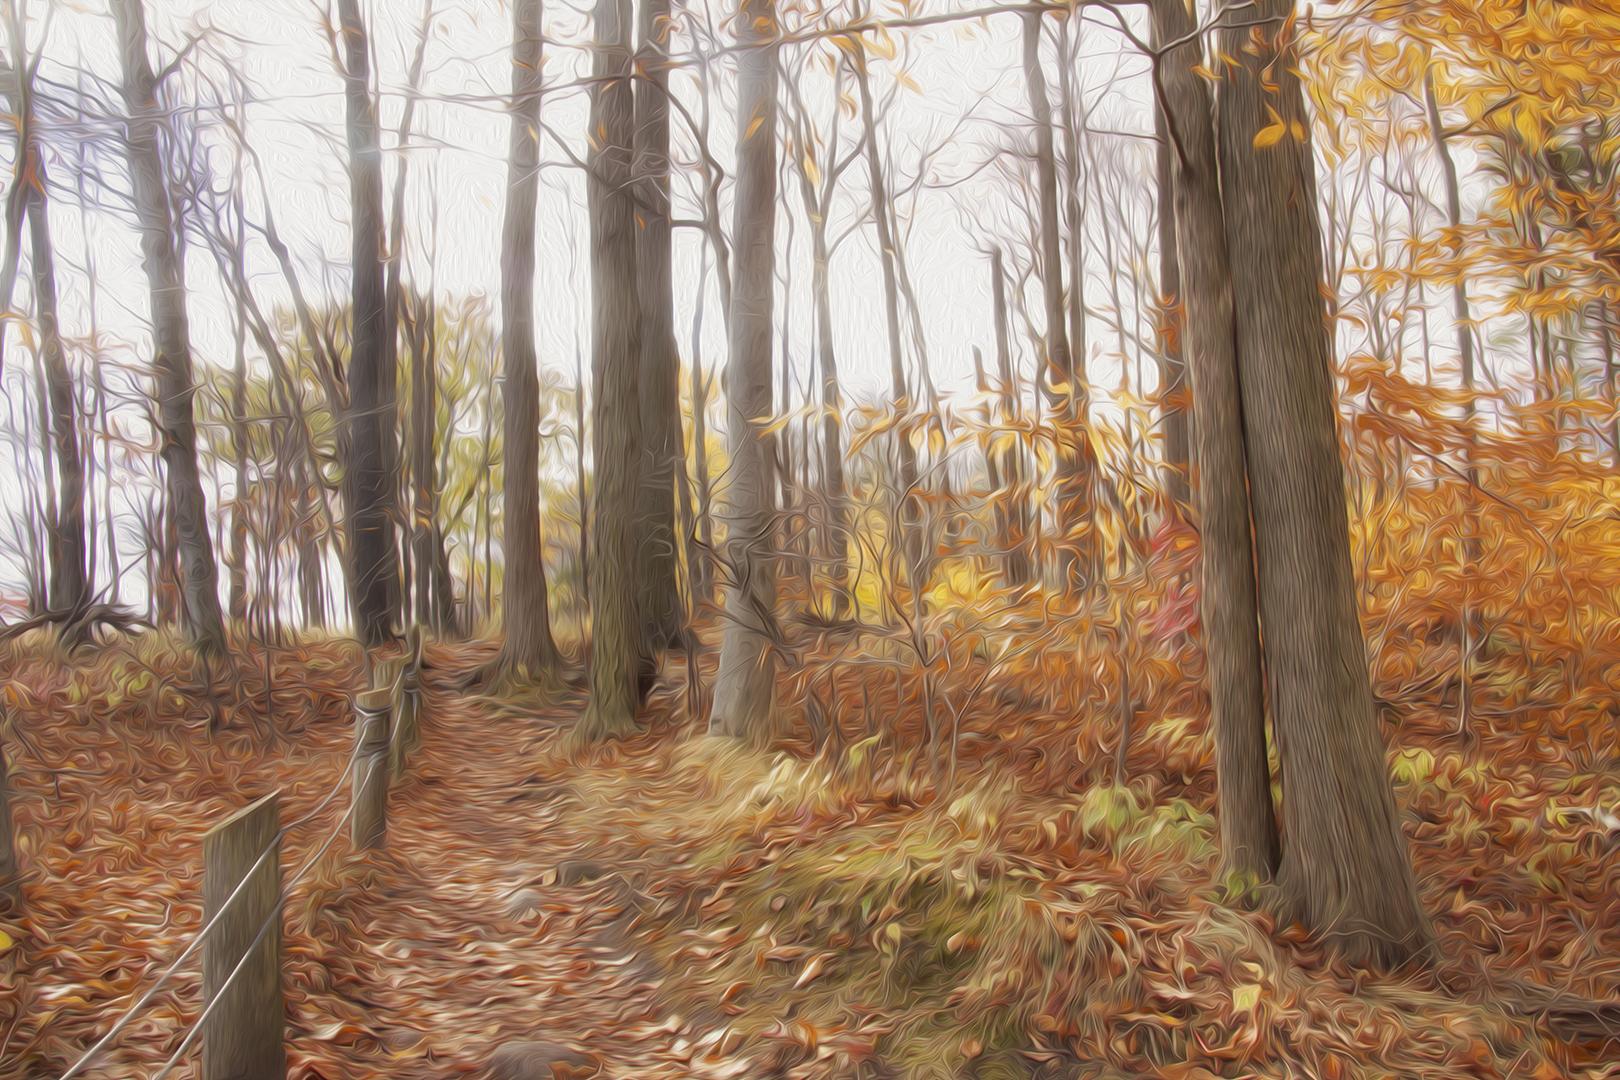 Peaceful Fall Day